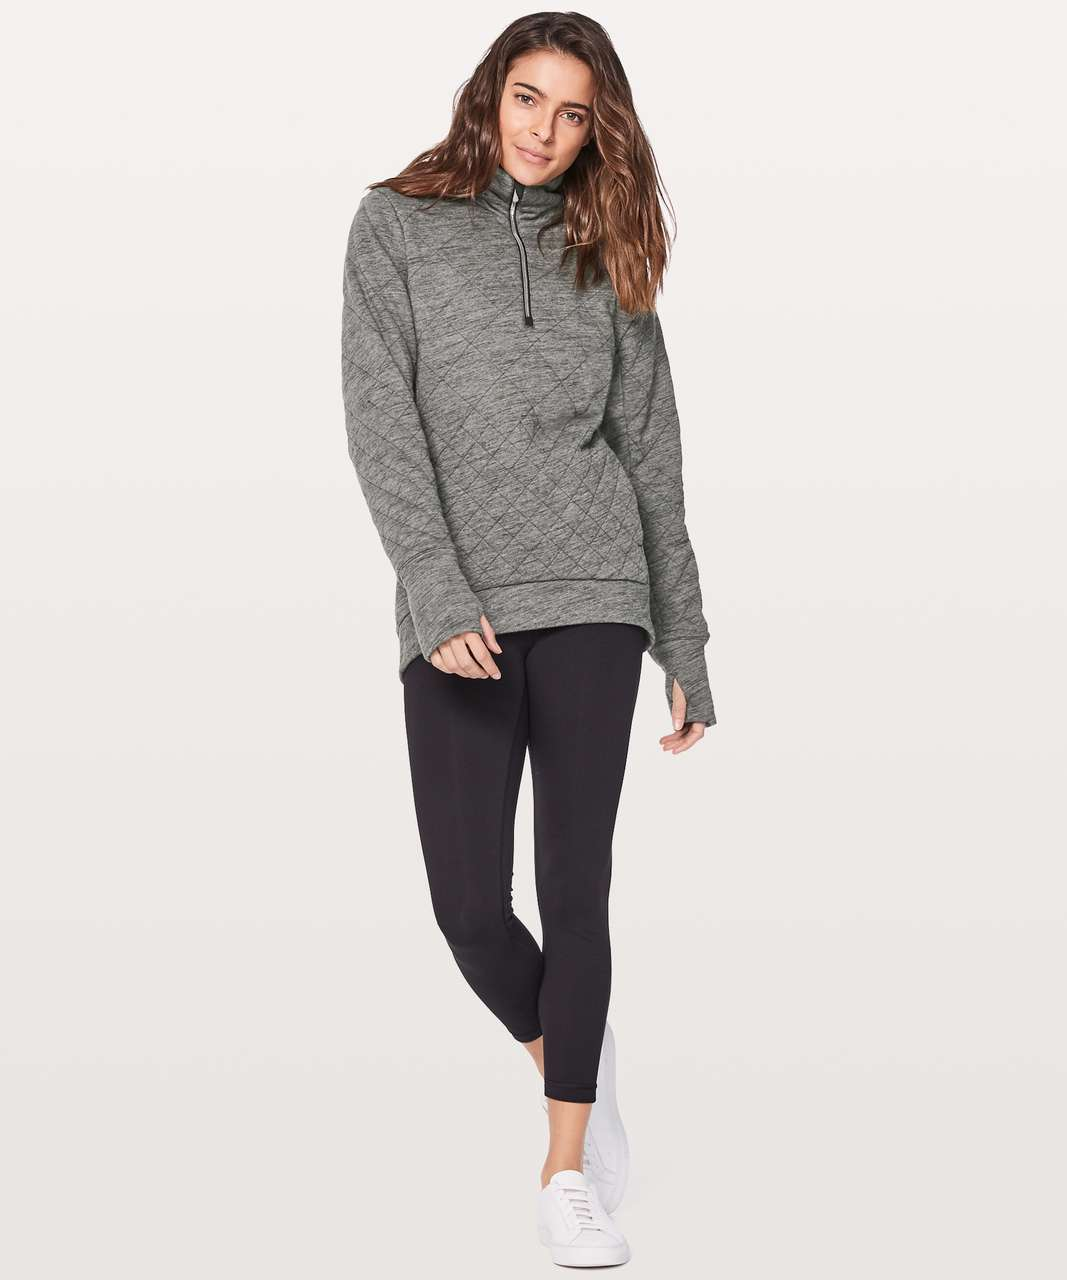 huge selection of 9019c f0fd7 Lululemon Forever Warm Pullover - Heathered Core Dark Grey